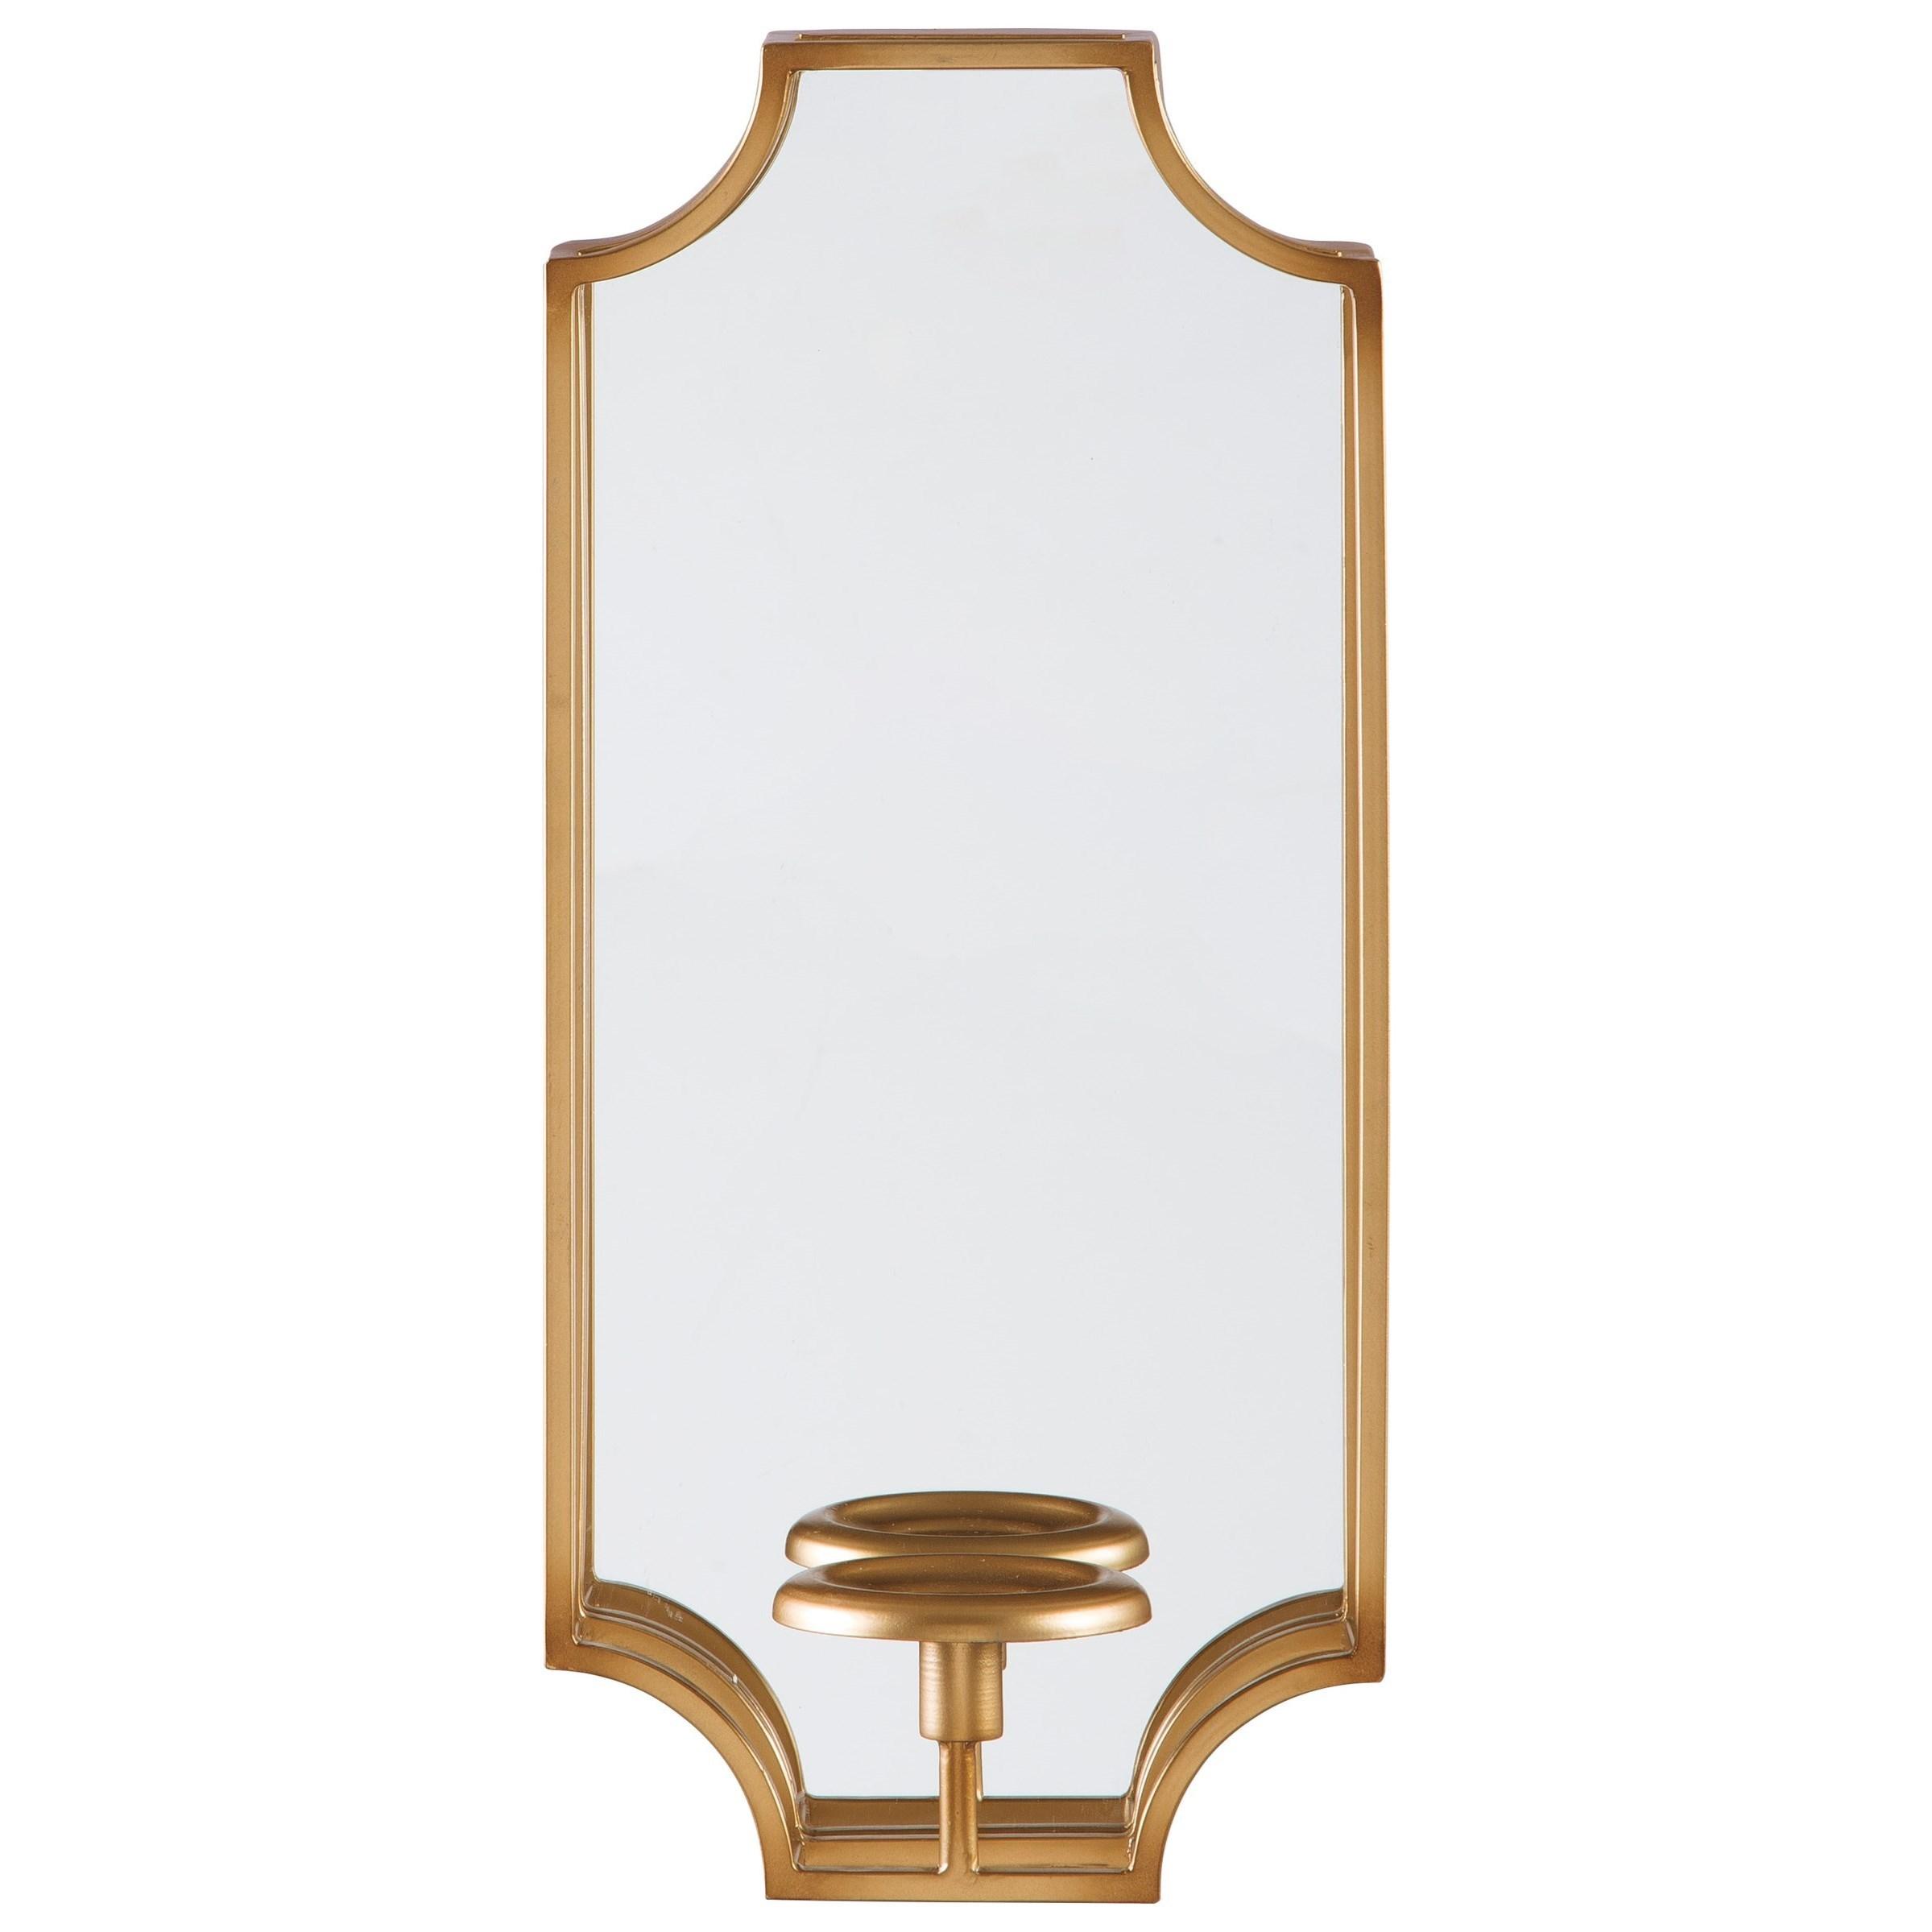 Dumi Gold Finish Wall Sconce/Mirror